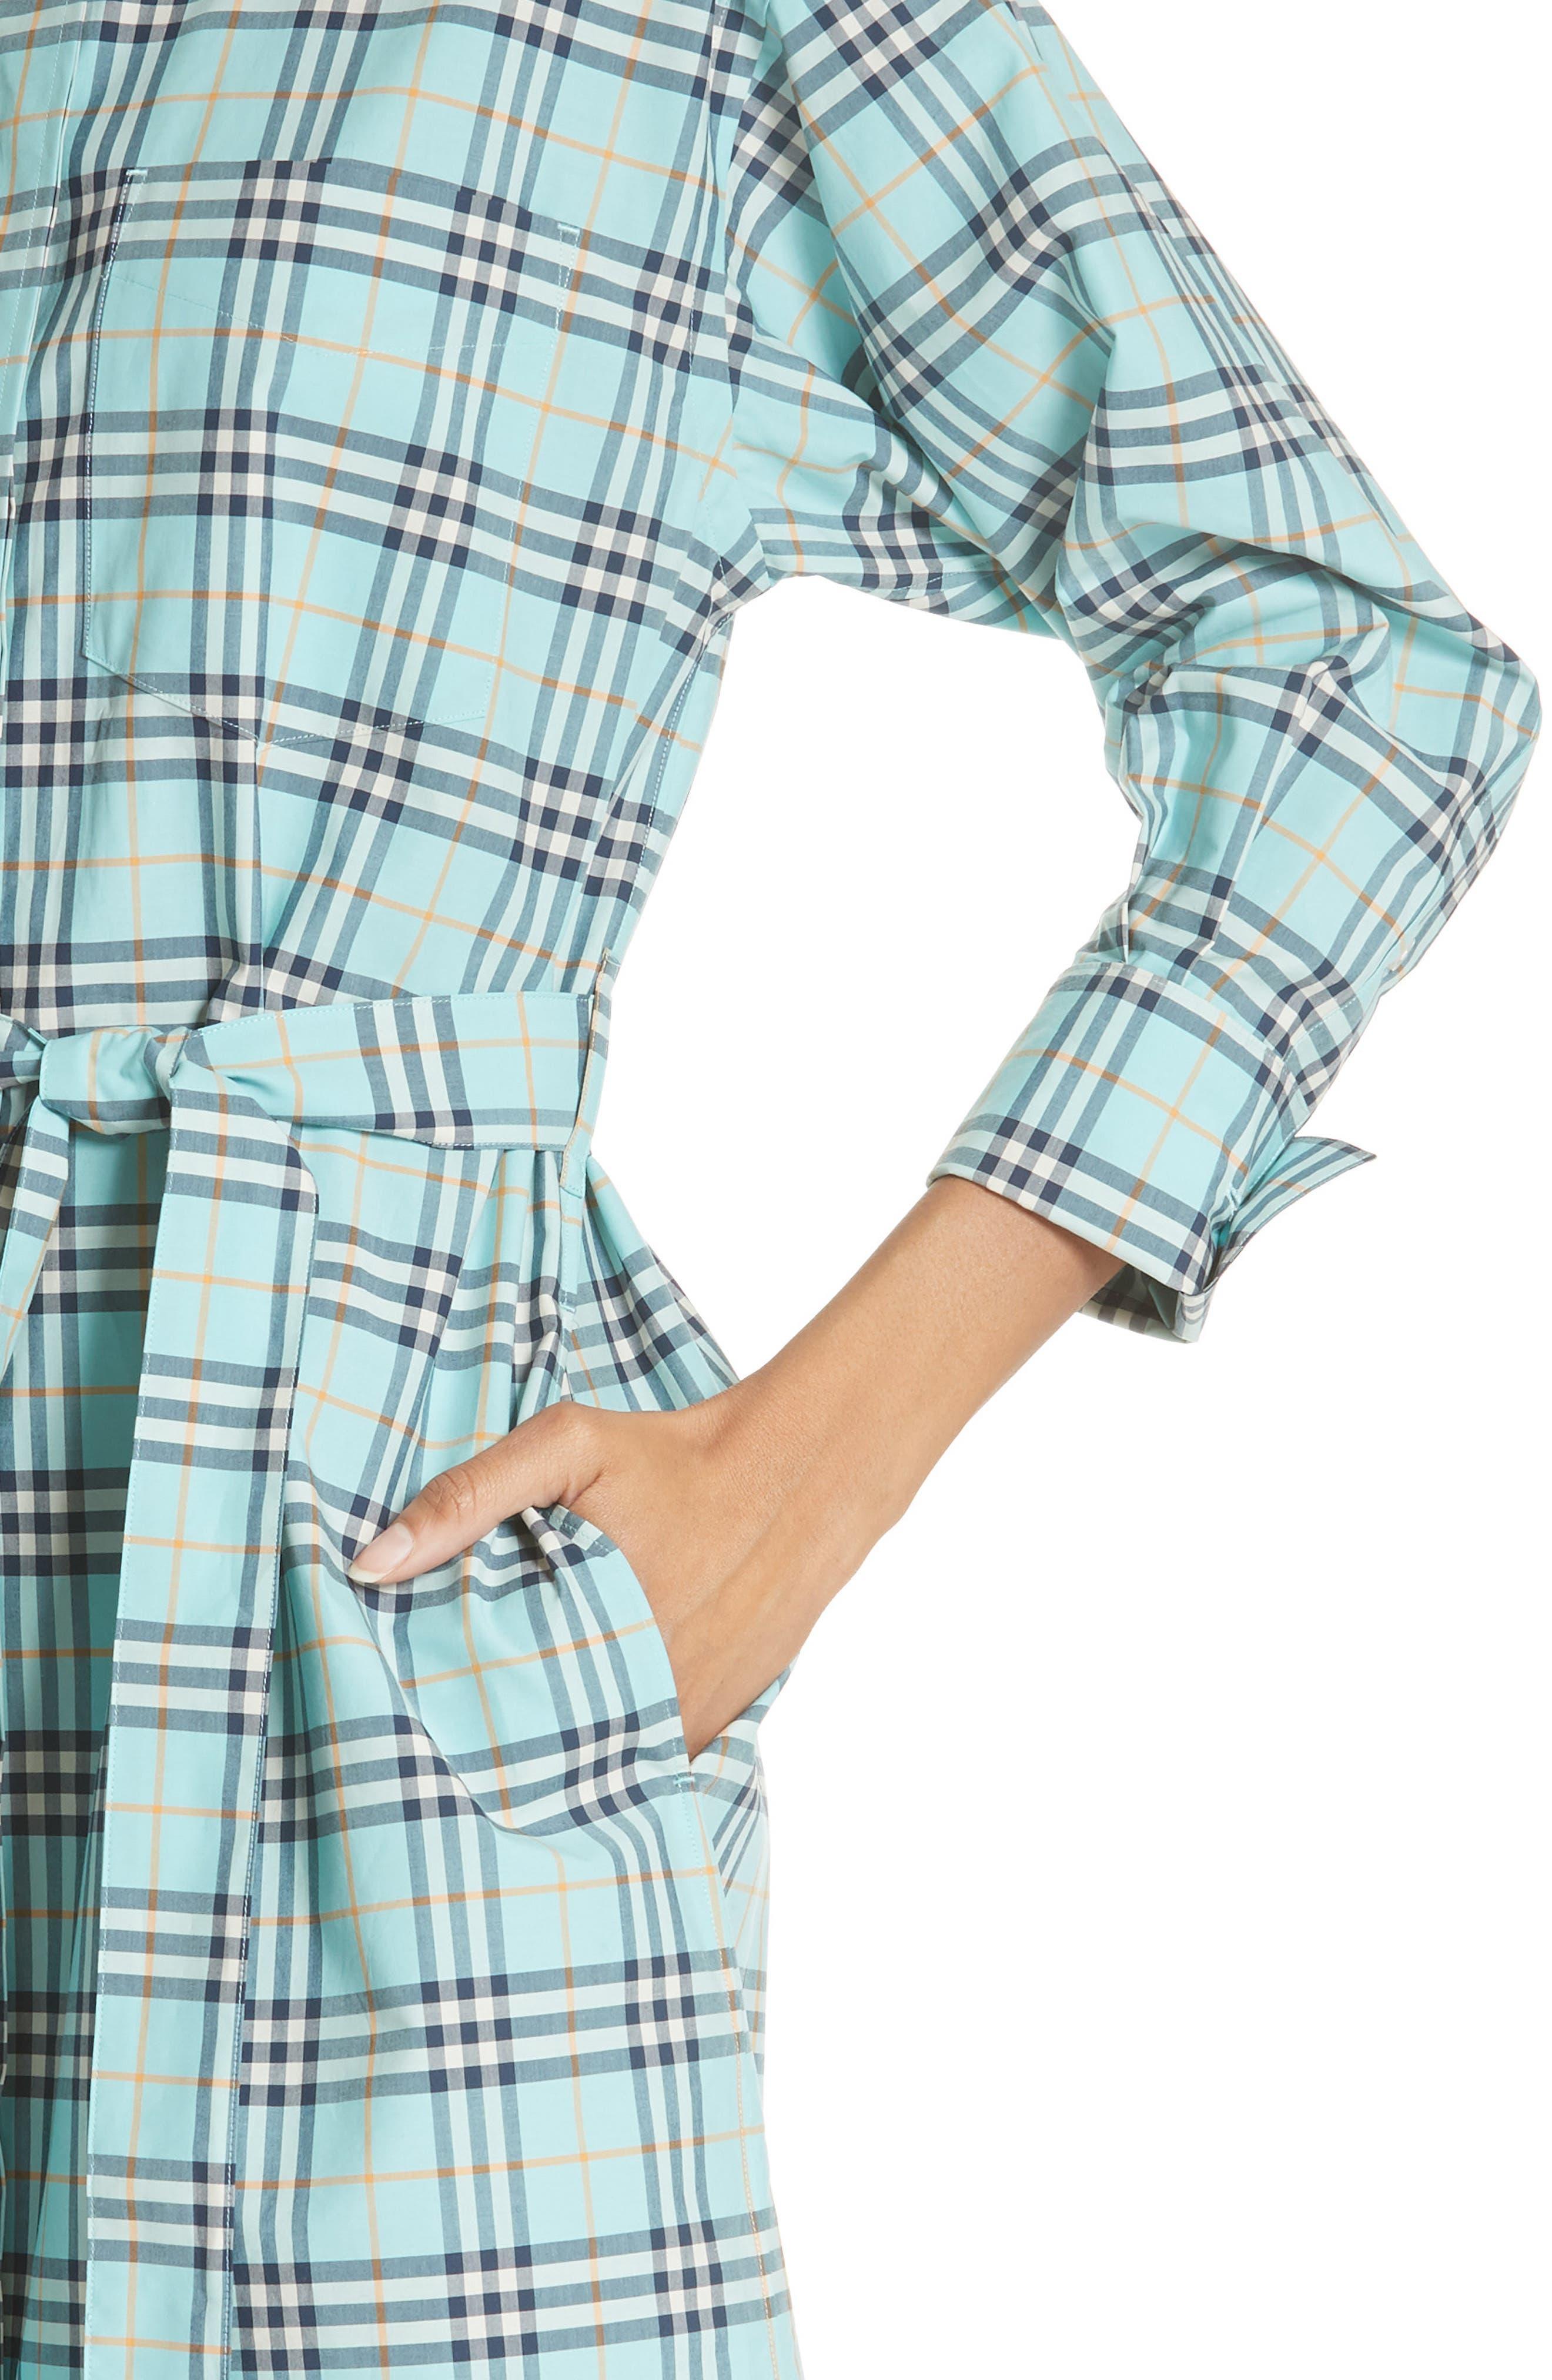 Isotto Tartan Shirtdress,                             Alternate thumbnail 4, color,                             BRIGHT AQUA